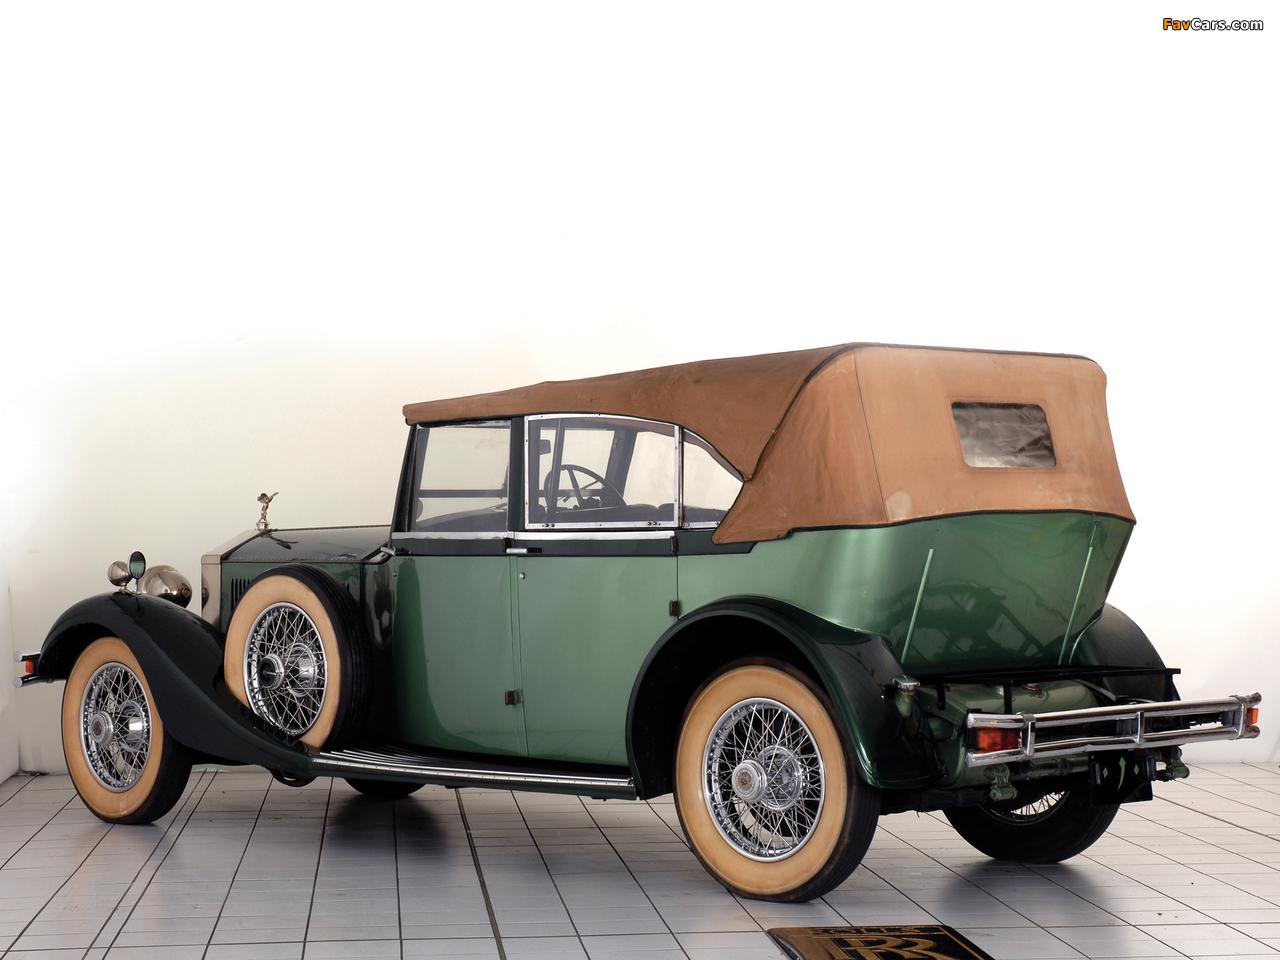 Rolls-Royce Phantom II 40/50 HP Cabriolet Hunting Car 1929 wallpapers (1280 x 960)